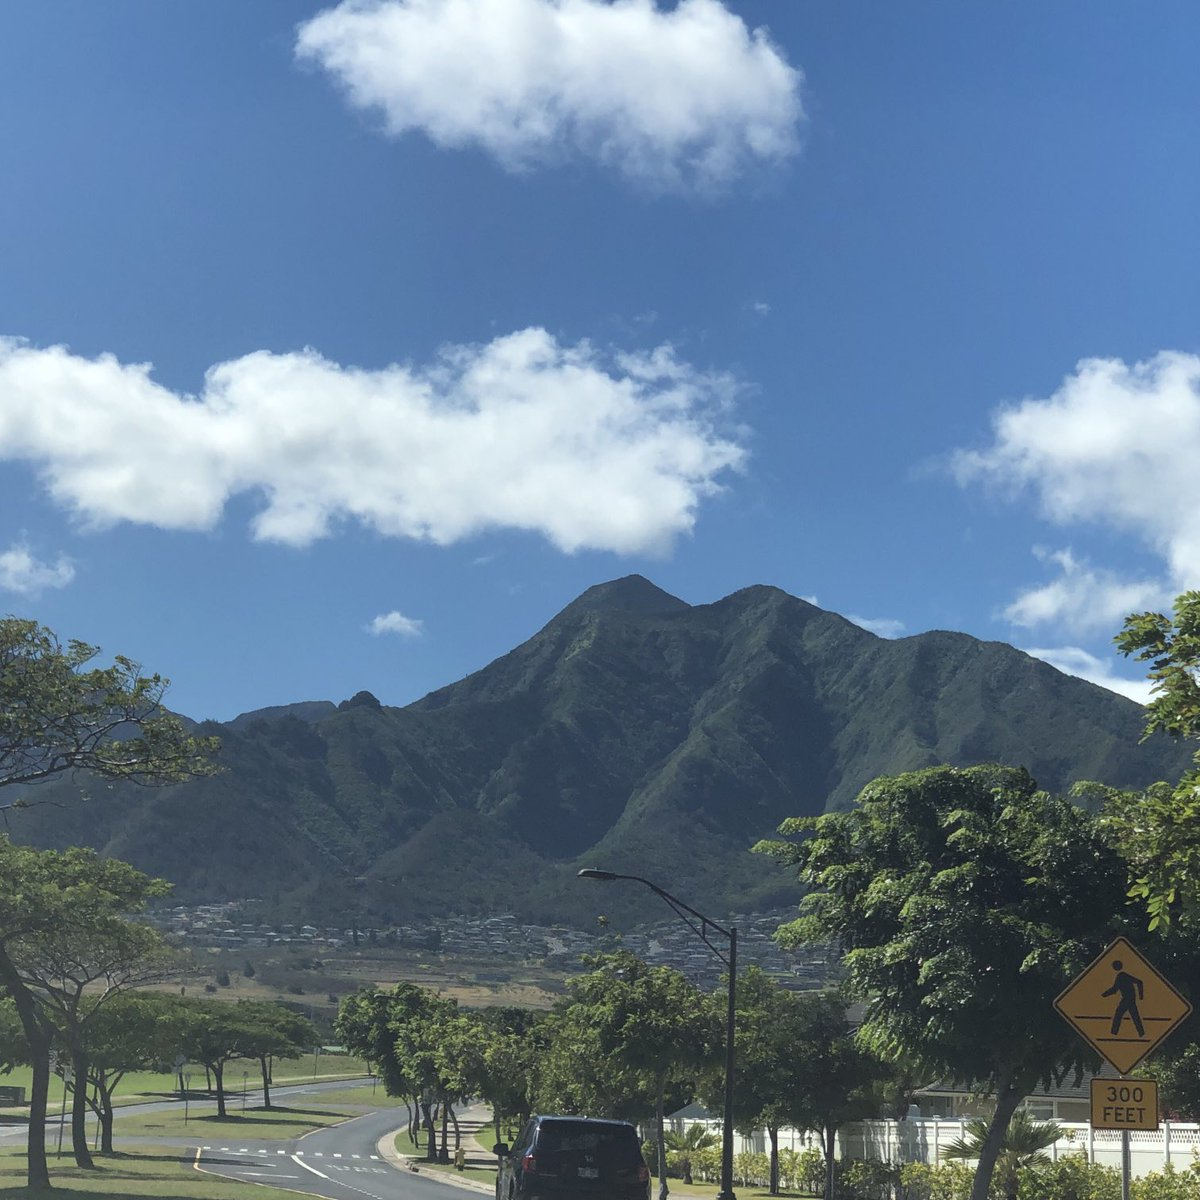 test Twitter Media - Beautiful sunny day in Wailuku. #cmweather #Maui #Wailuku #MagicalMaui #Mauinokaoi #beautifulday https://t.co/VA5jsnFwQB